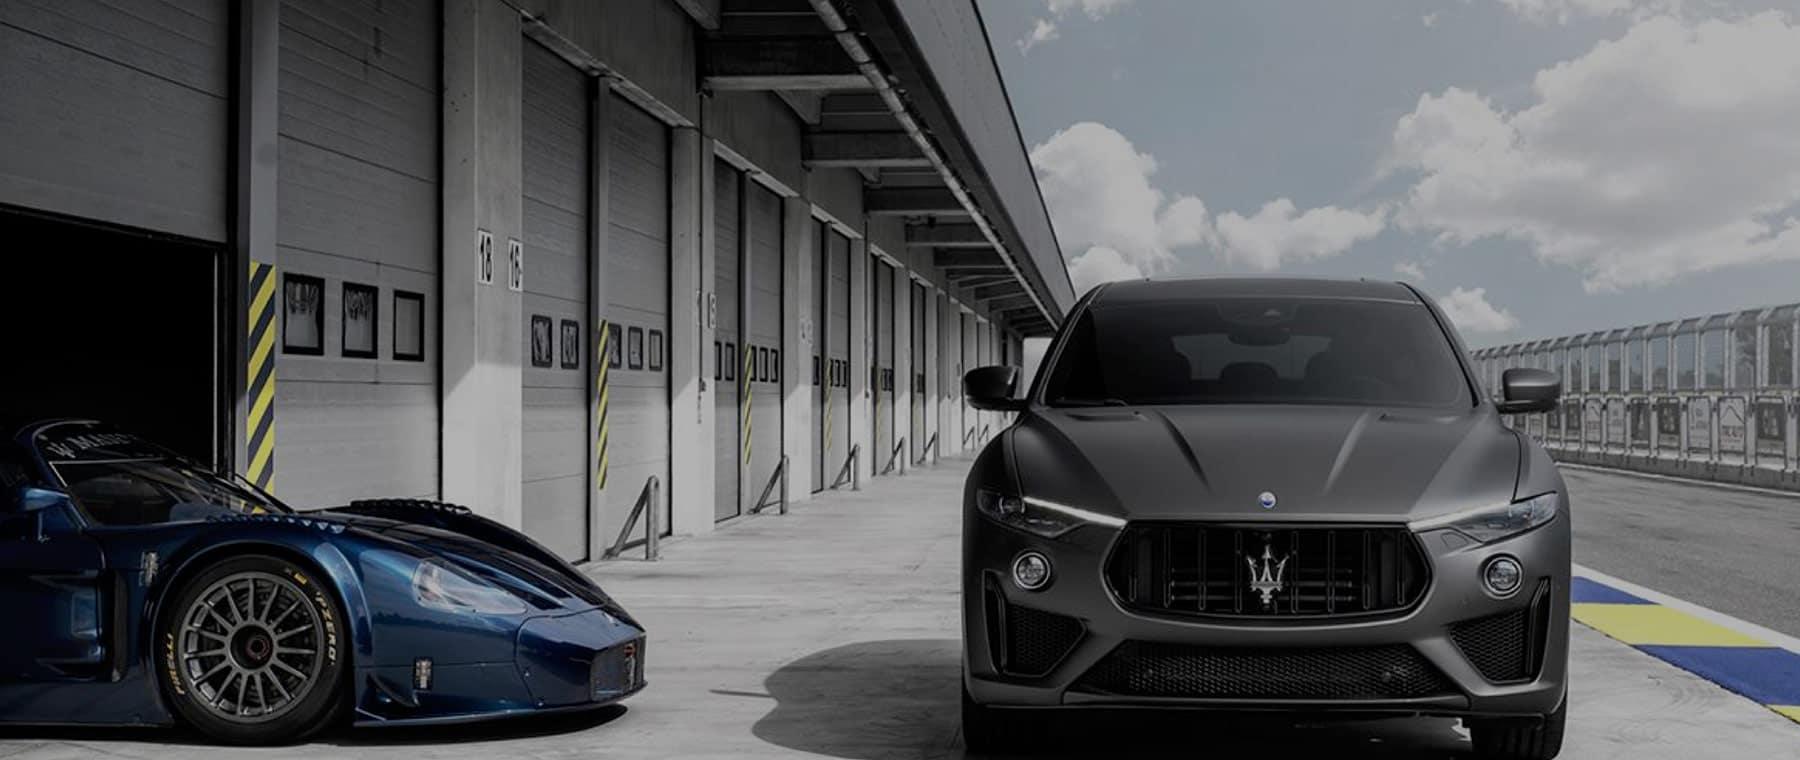 Maserati Street Car and Race Car